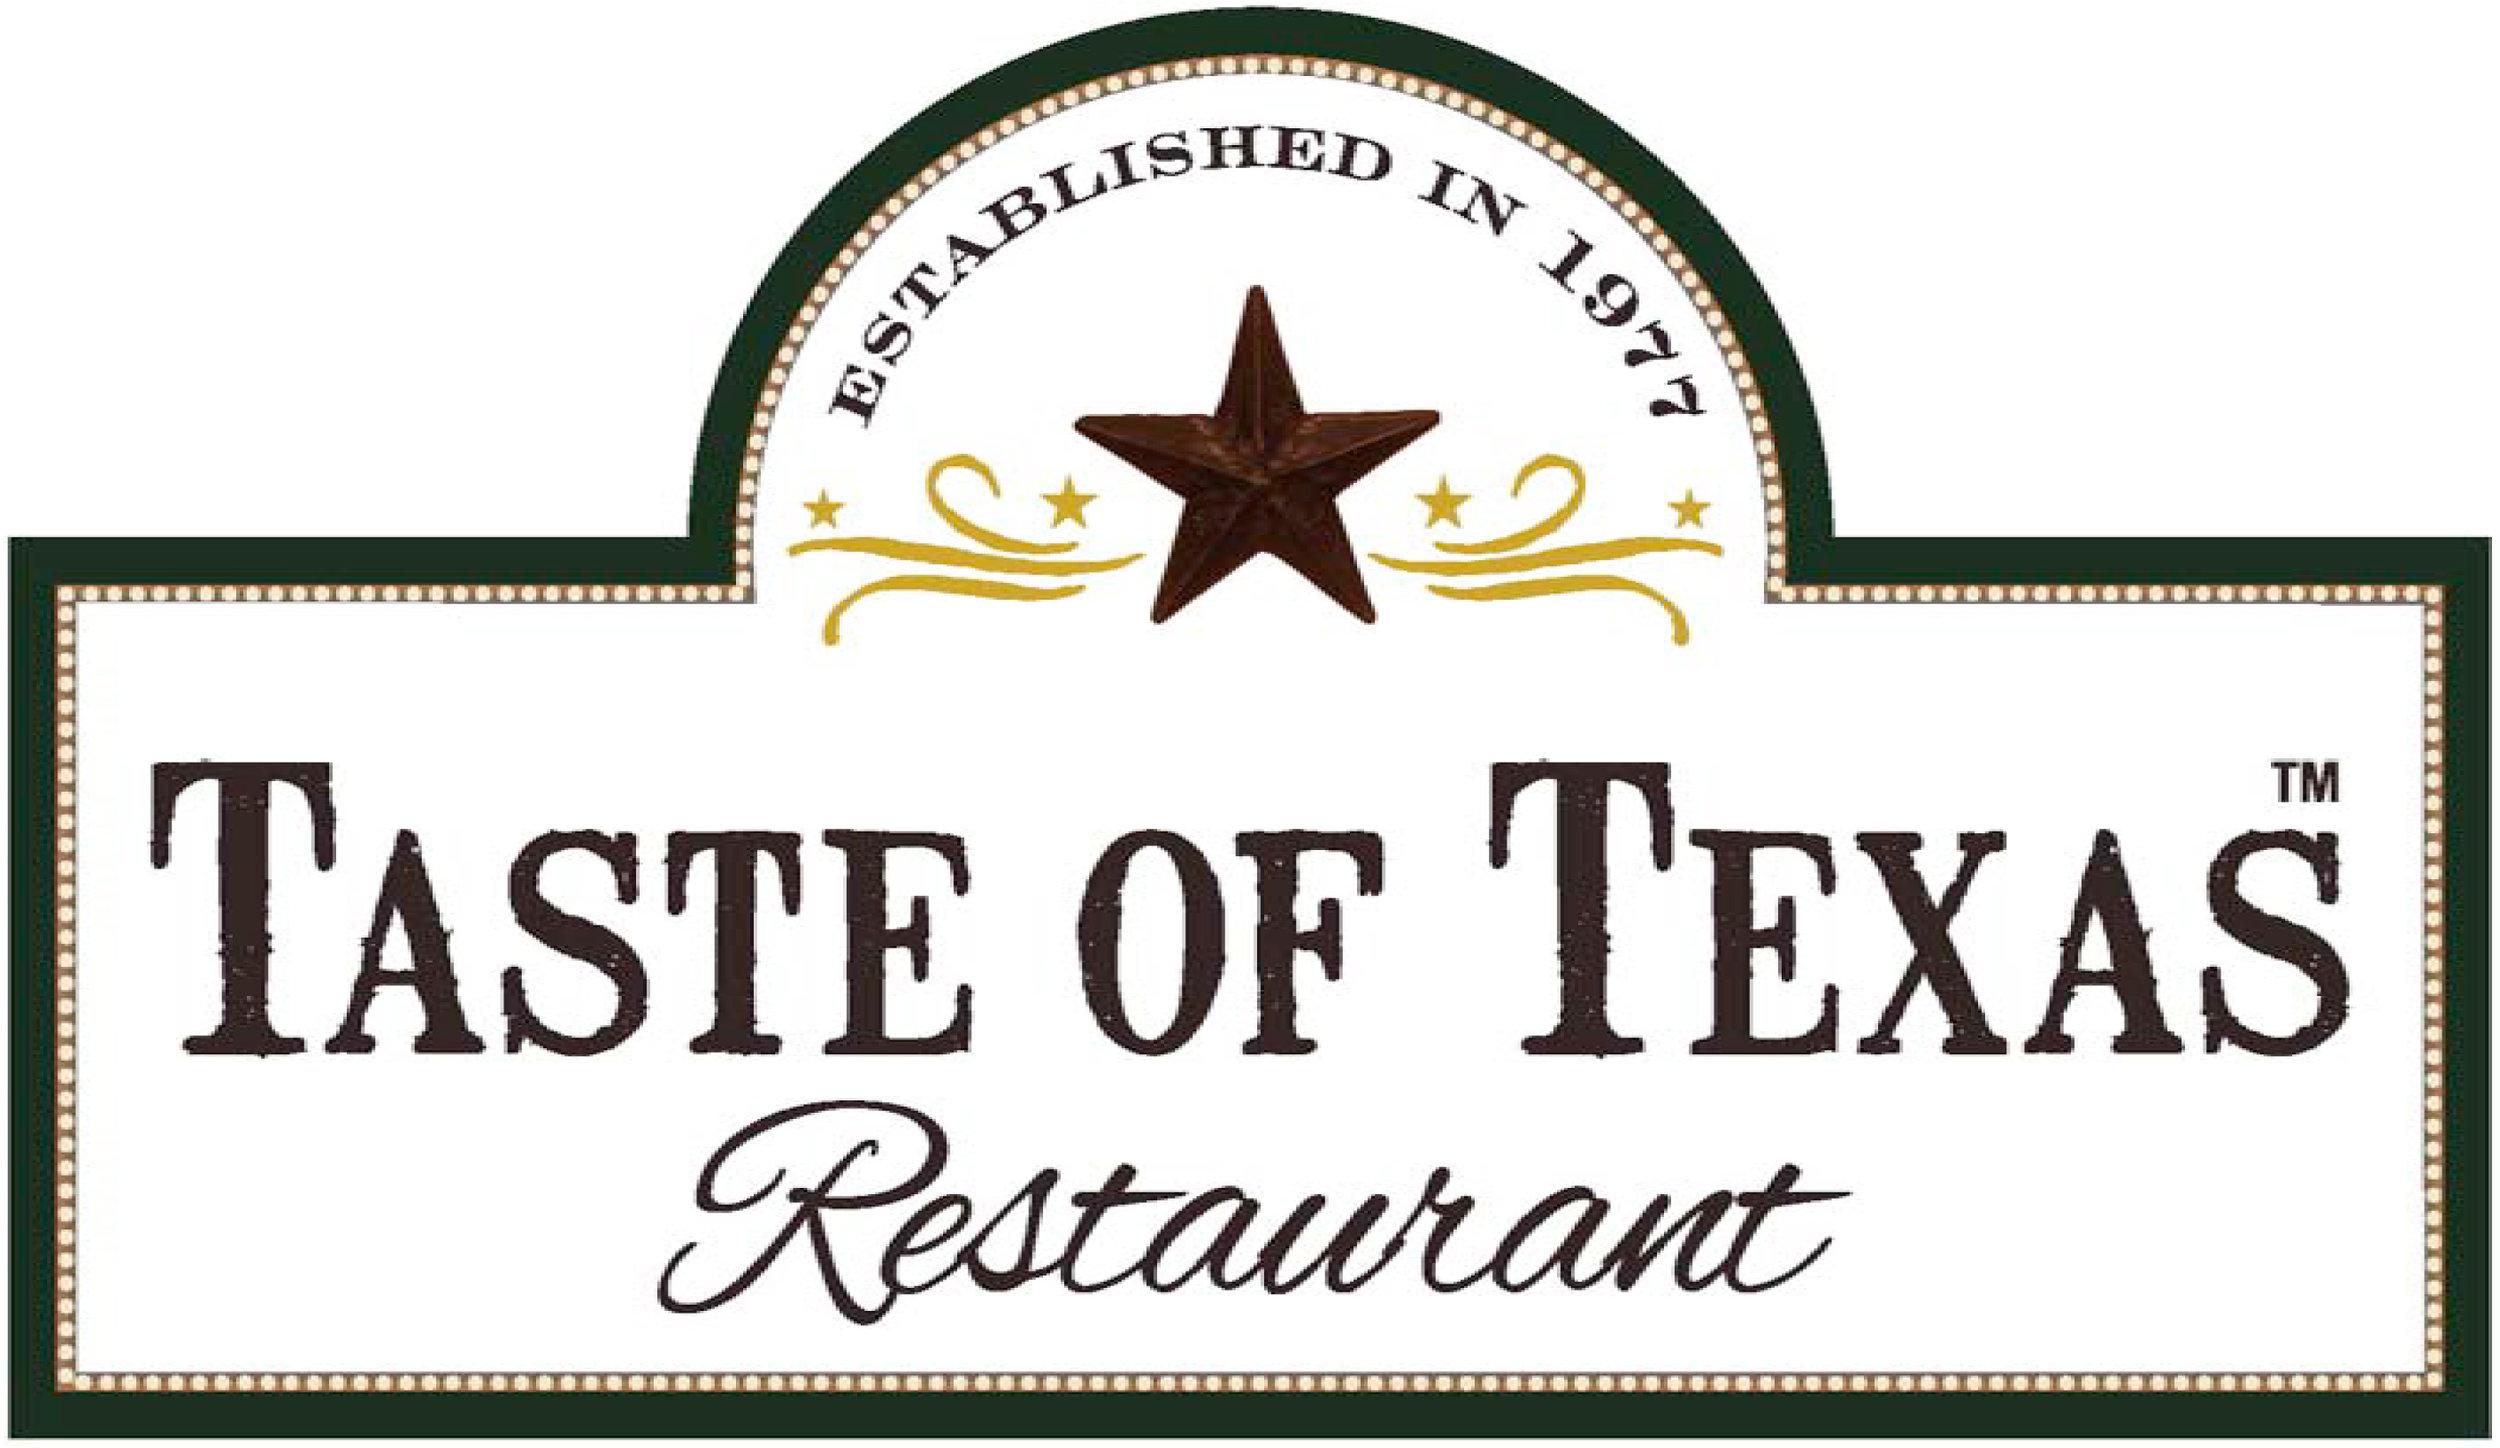 Taste-of-Texas.jpg